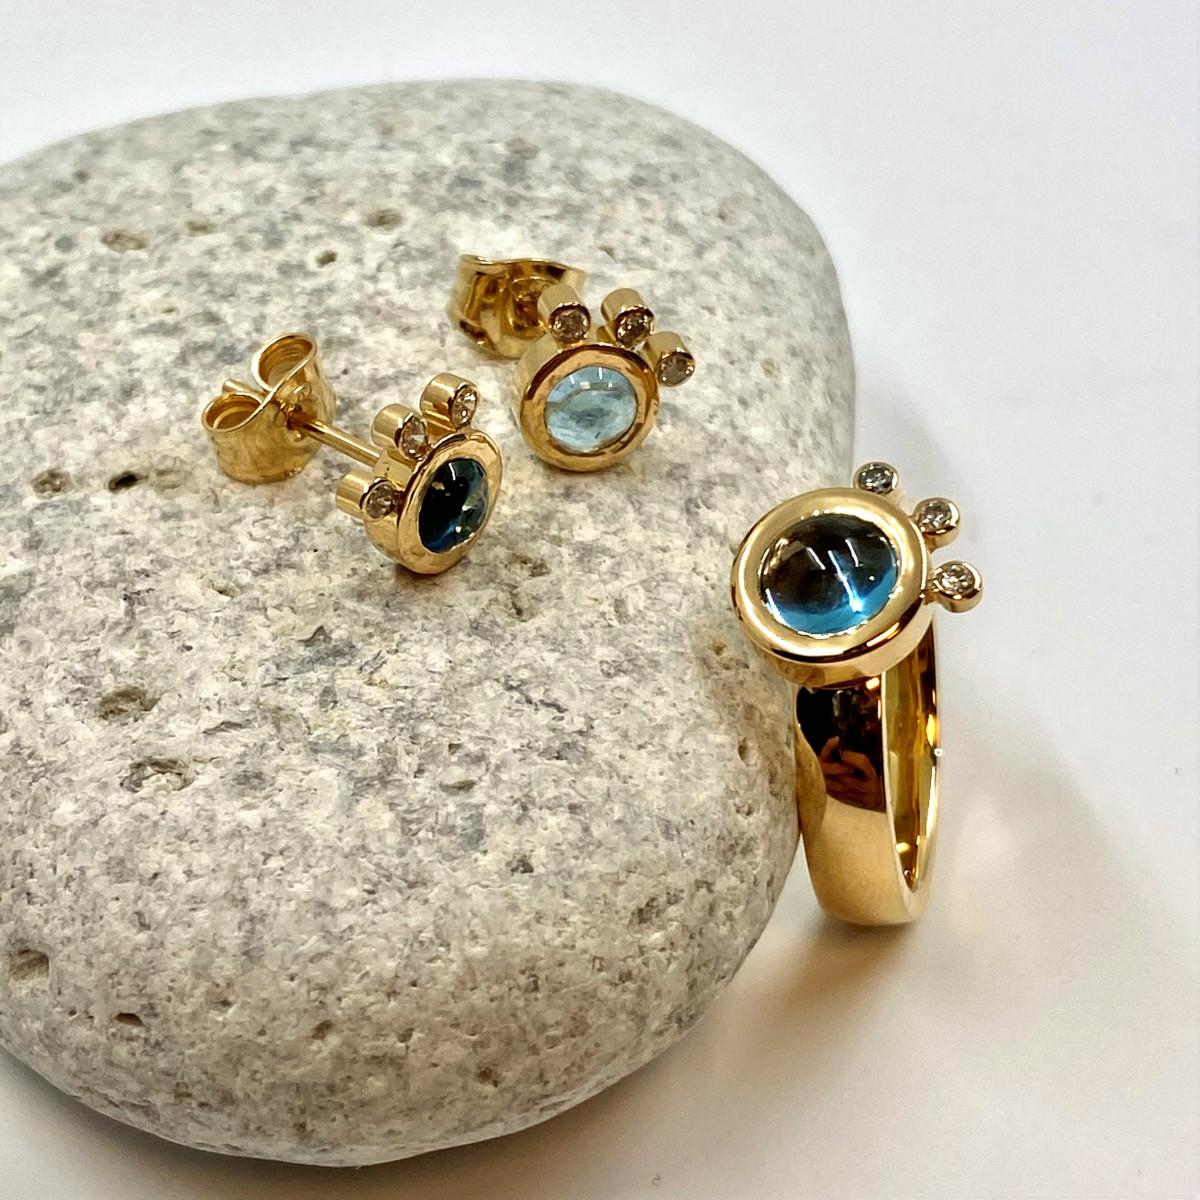 Blå topasring, stenring, bruna diamanter